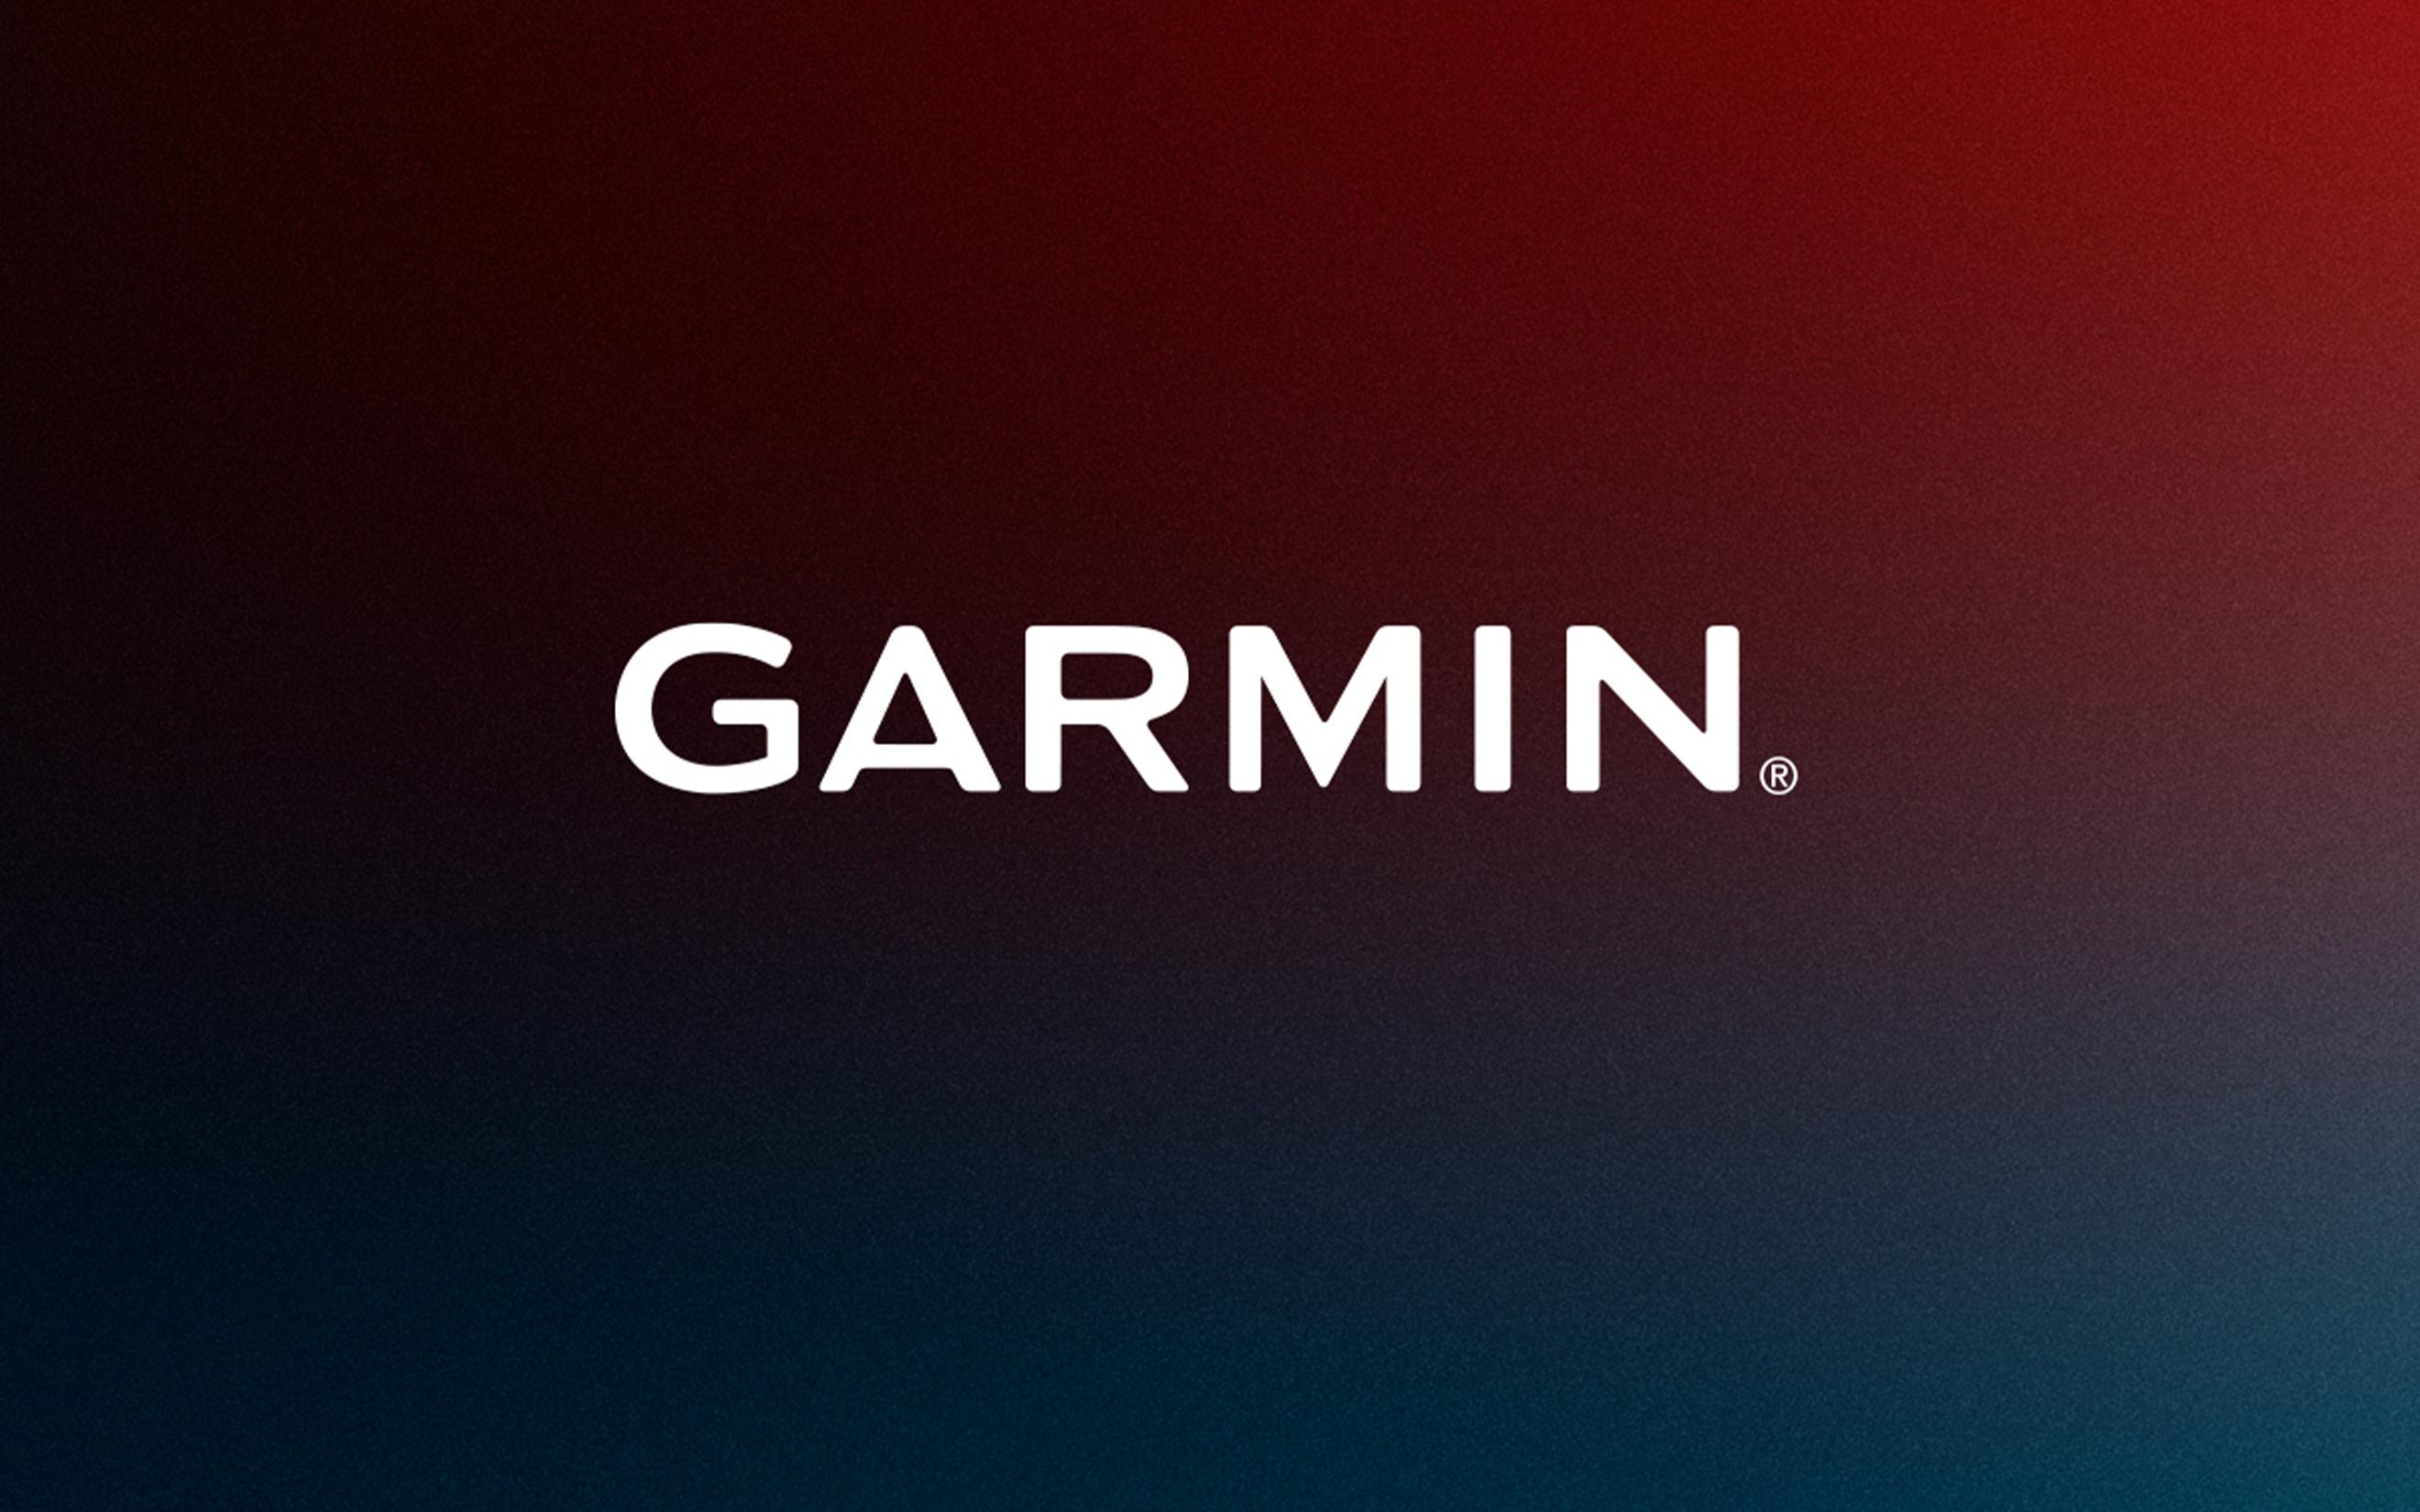 Astralis and Garmin In New, Strategic Partnership